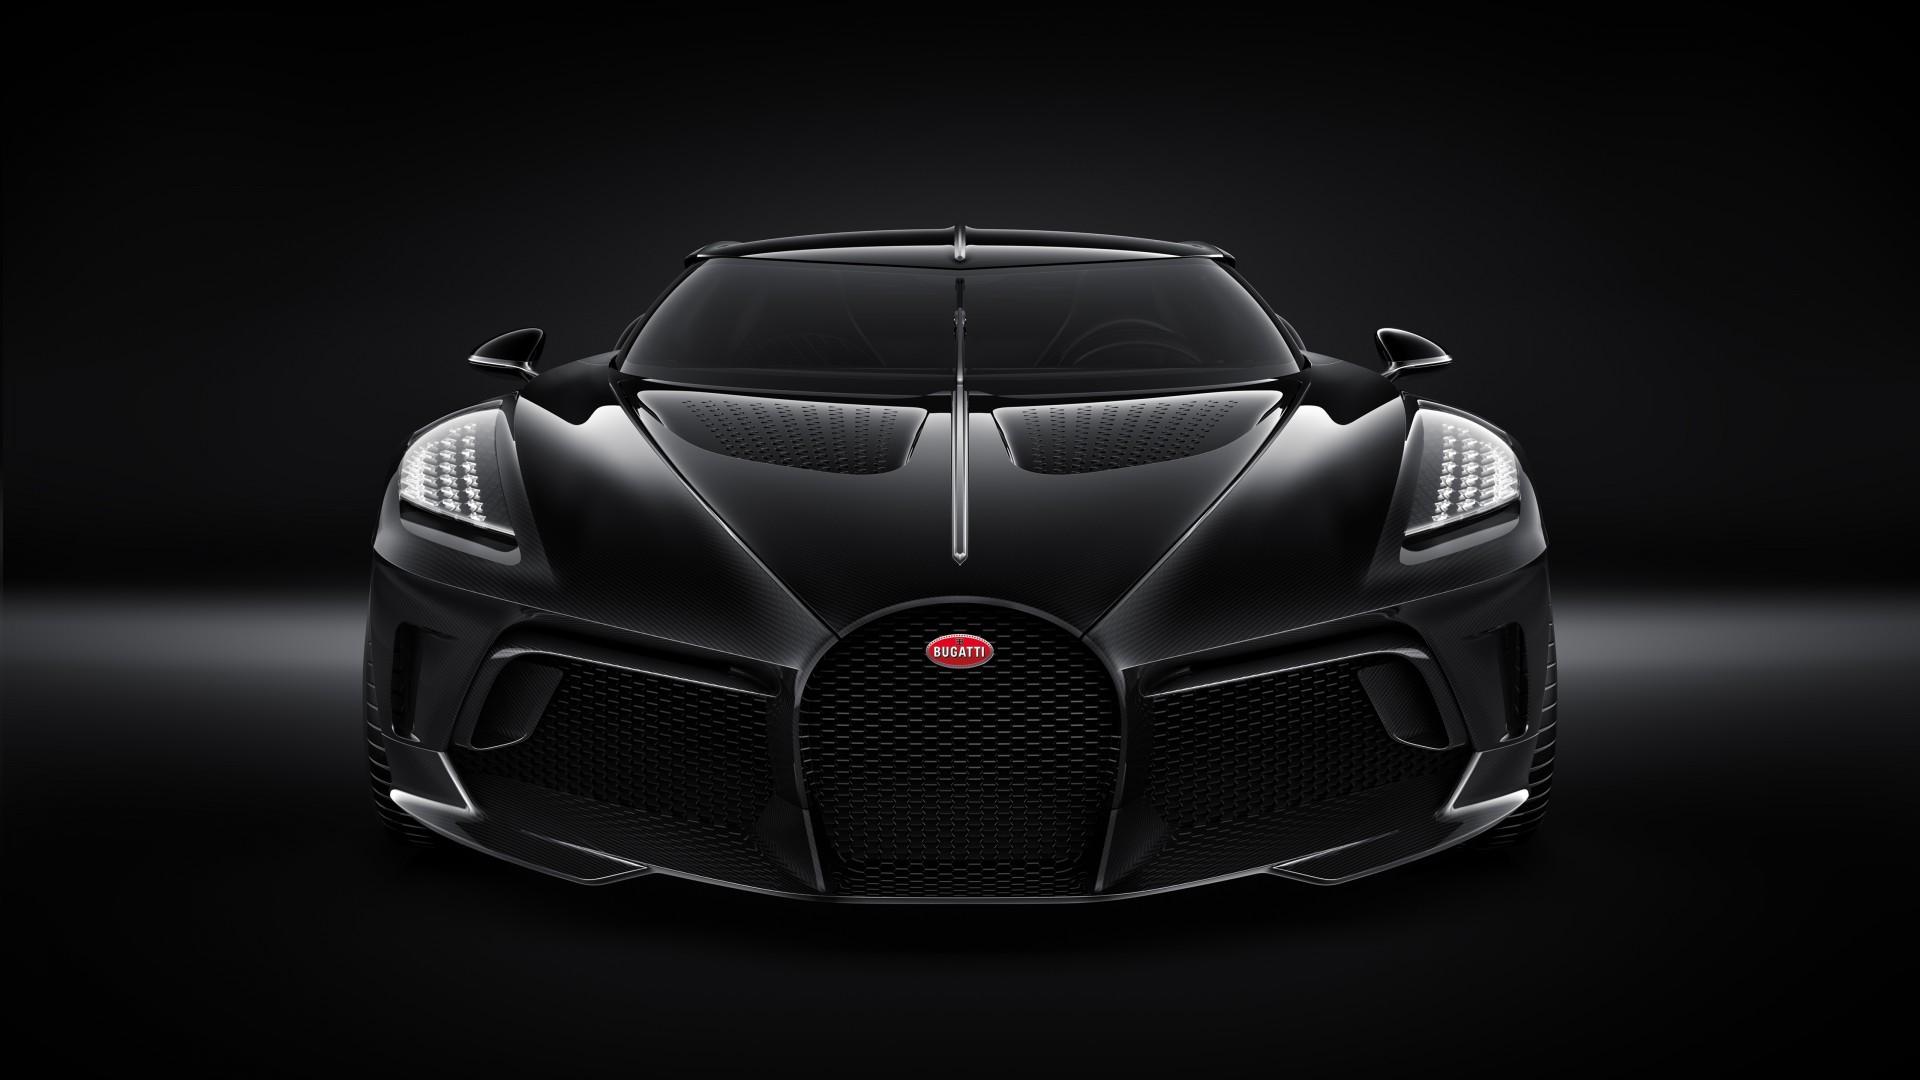 Bugatti La Voiture Noire 2019 4k 3 Wallpaper Hd Car